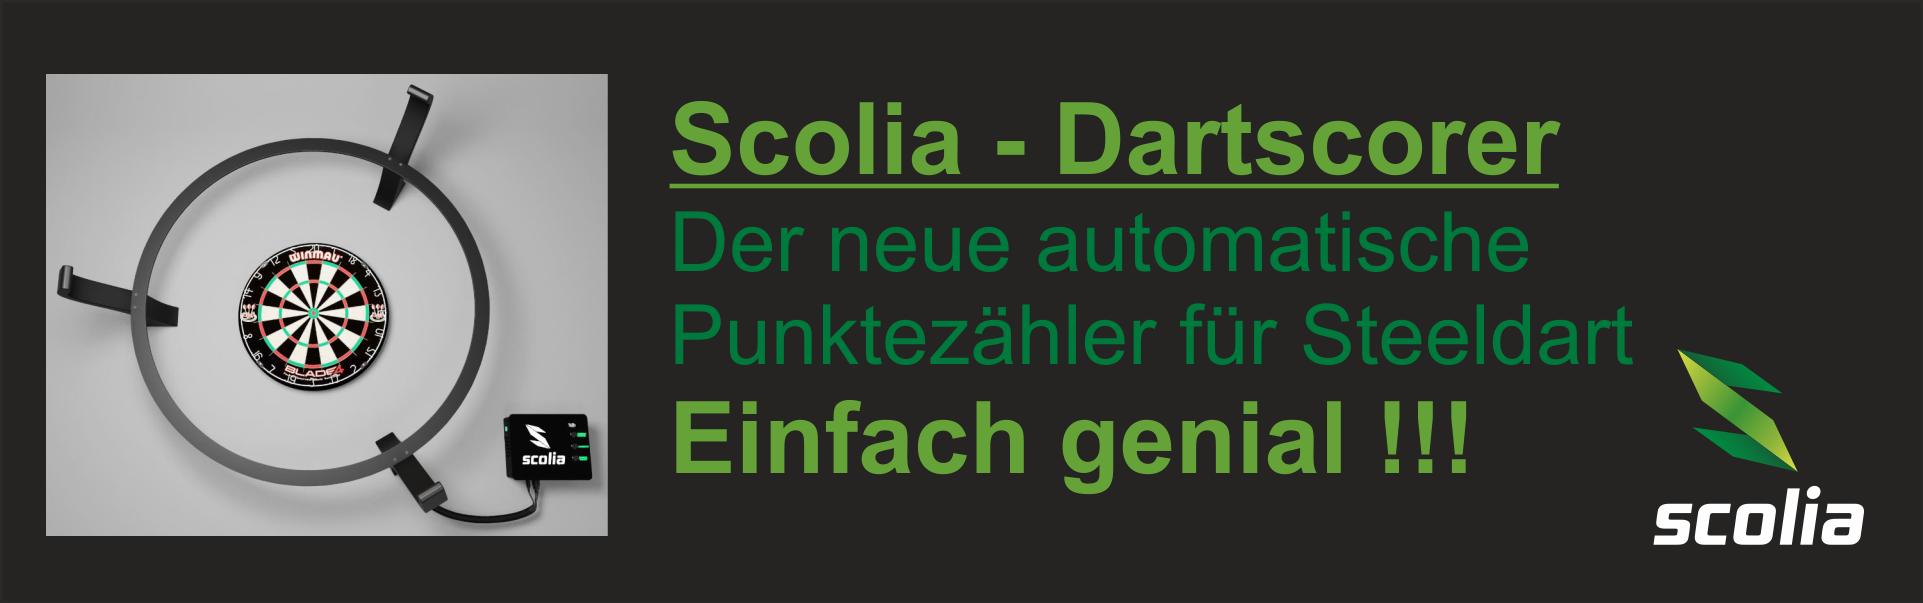 Scolia Dart Scorer